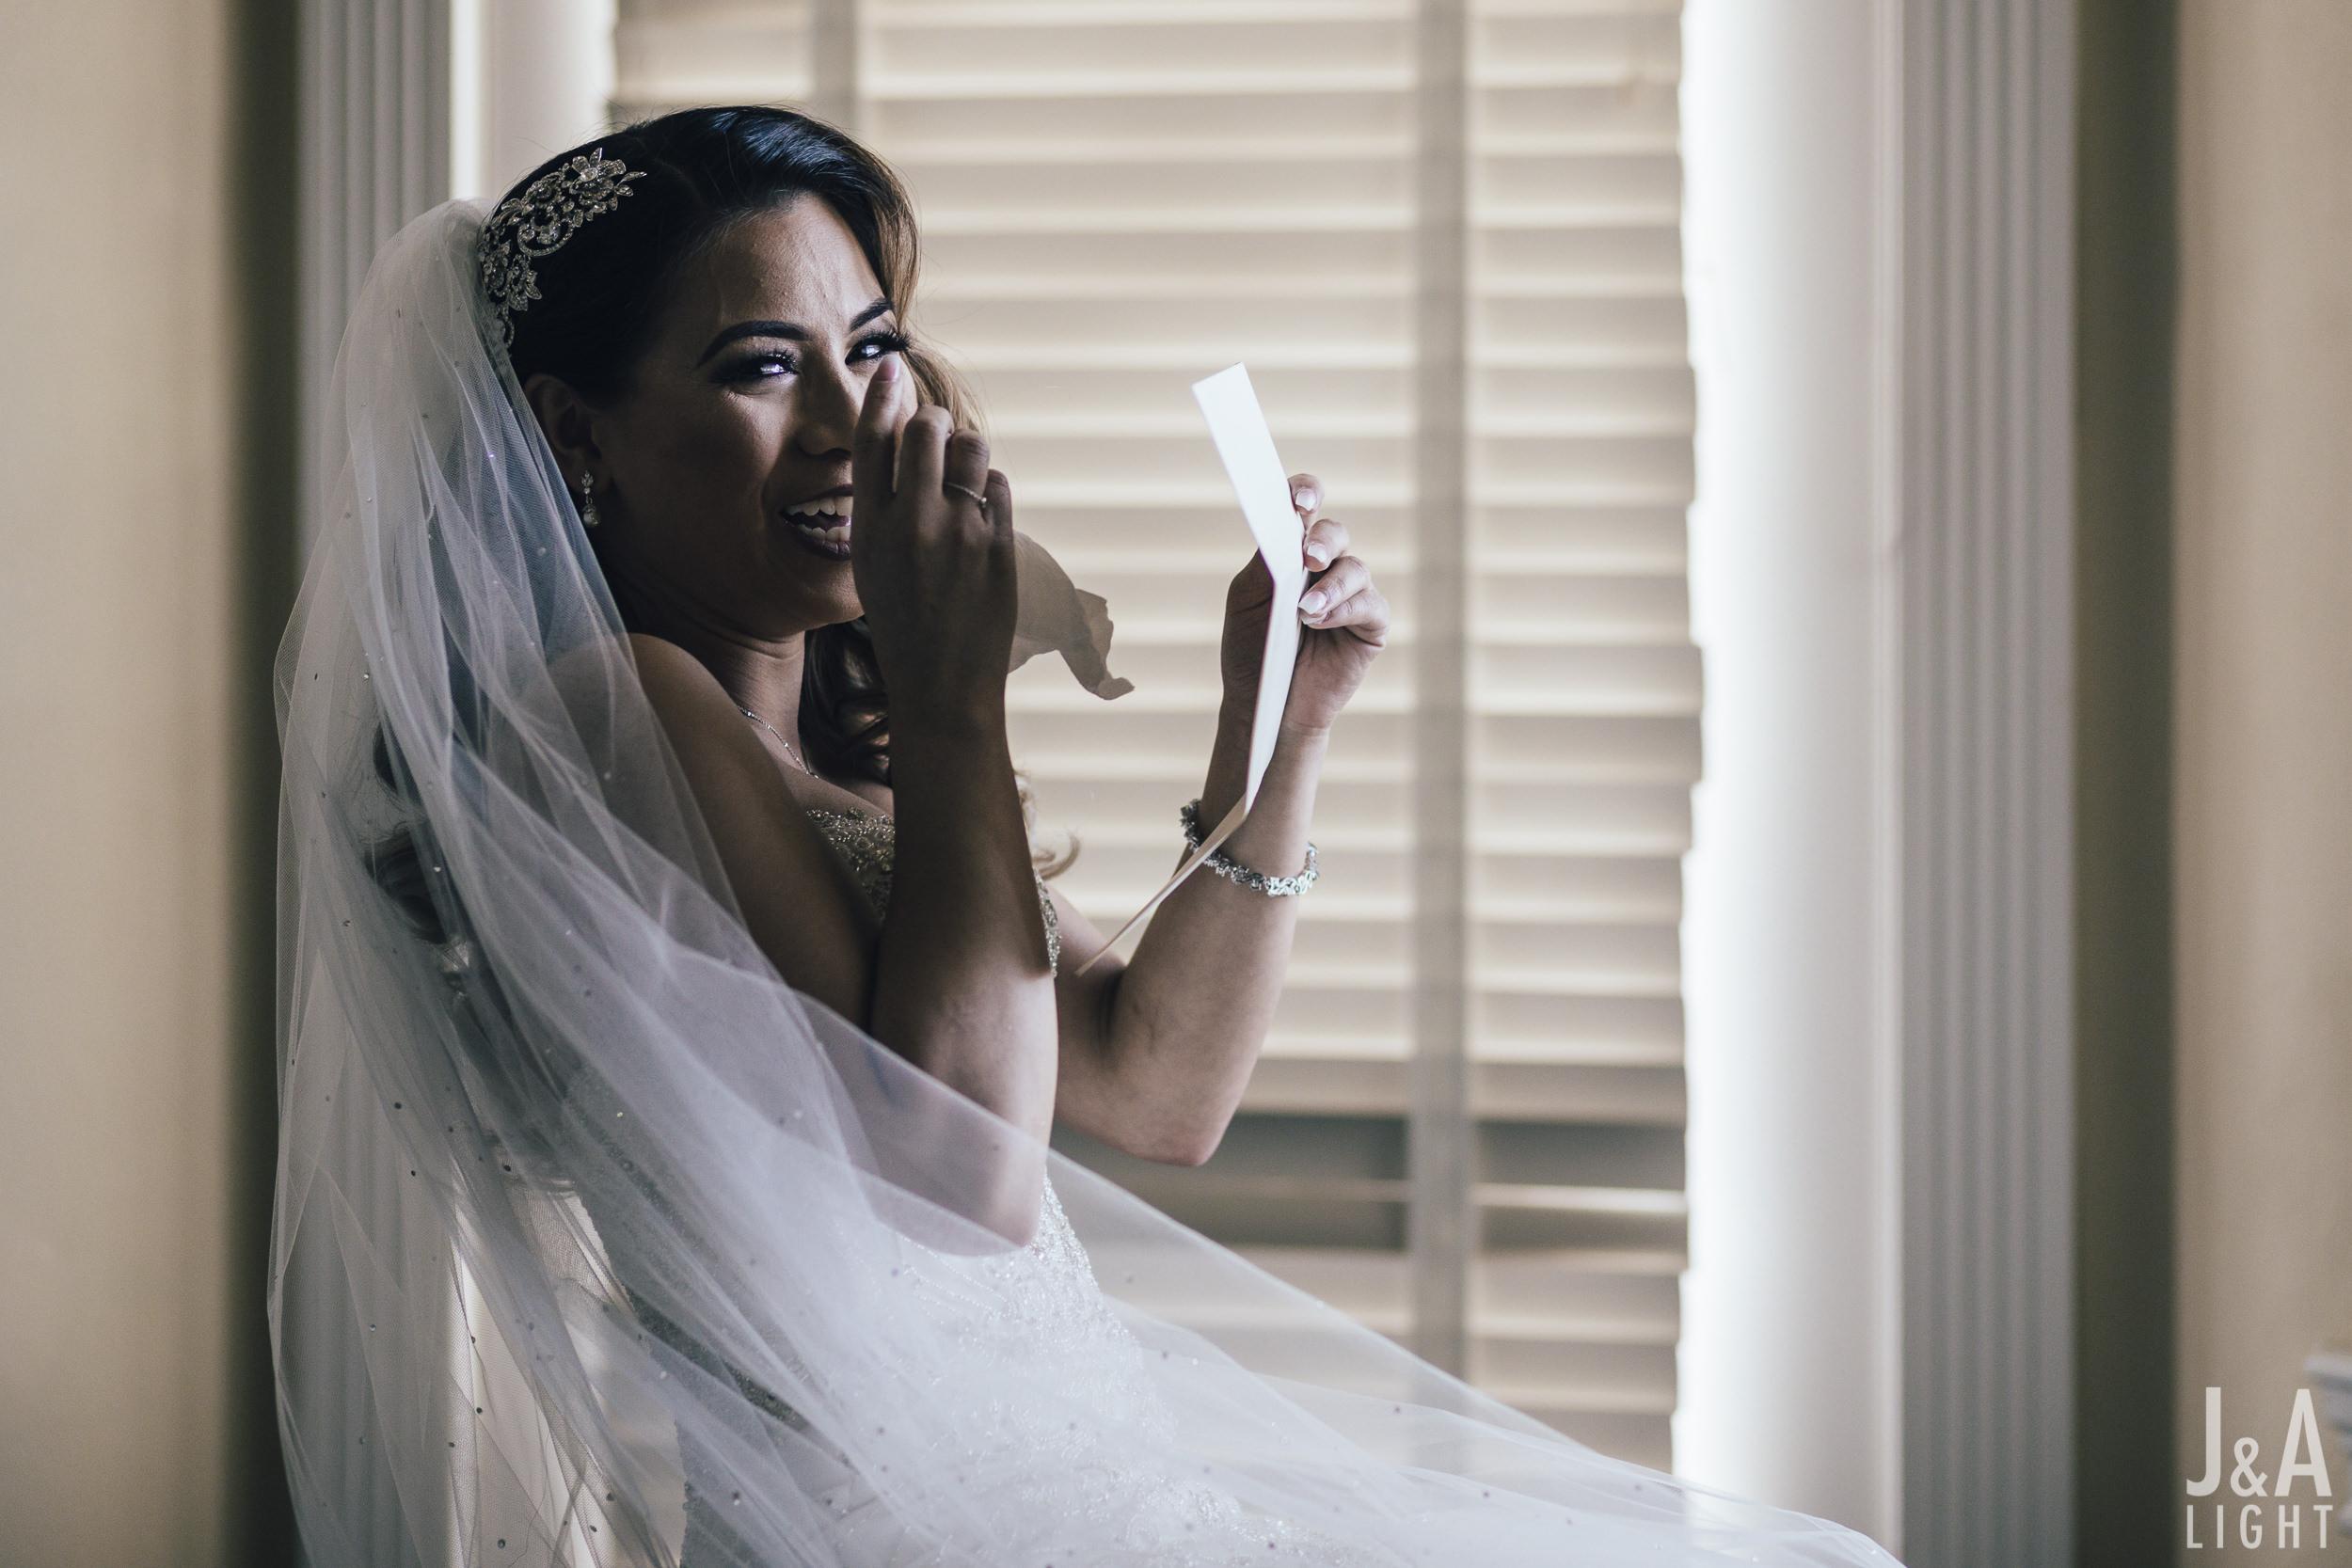 20171014-JanDan-LosBanos-GlassMansion-Wedding-Blog-022.jpg